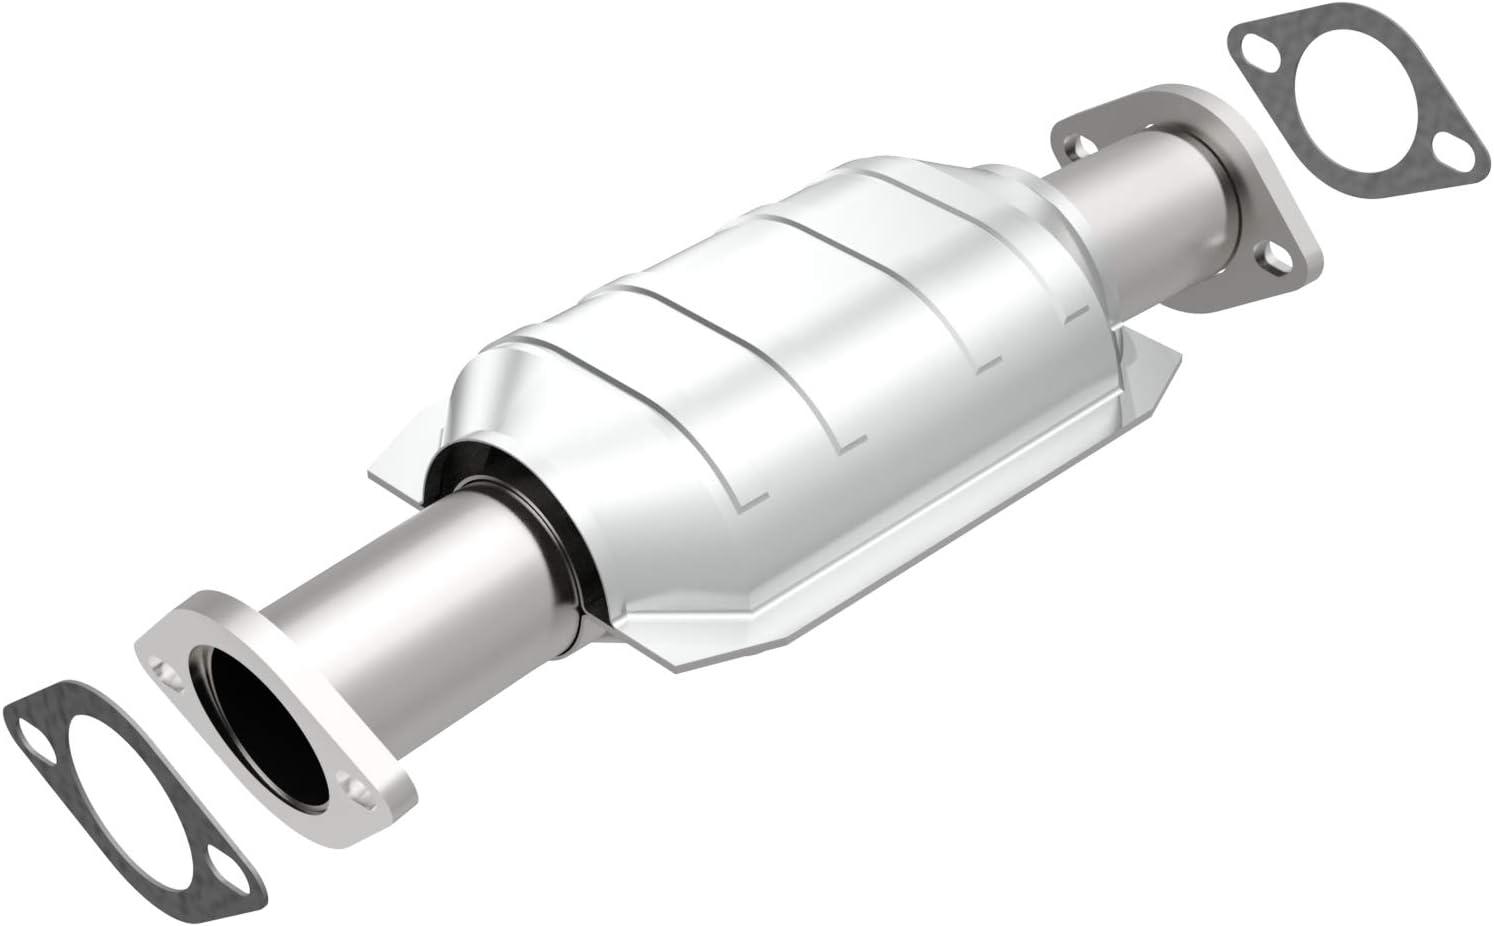 Non CARB compliant MagnaFlow 51511 Direct Fit Catalytic Converter